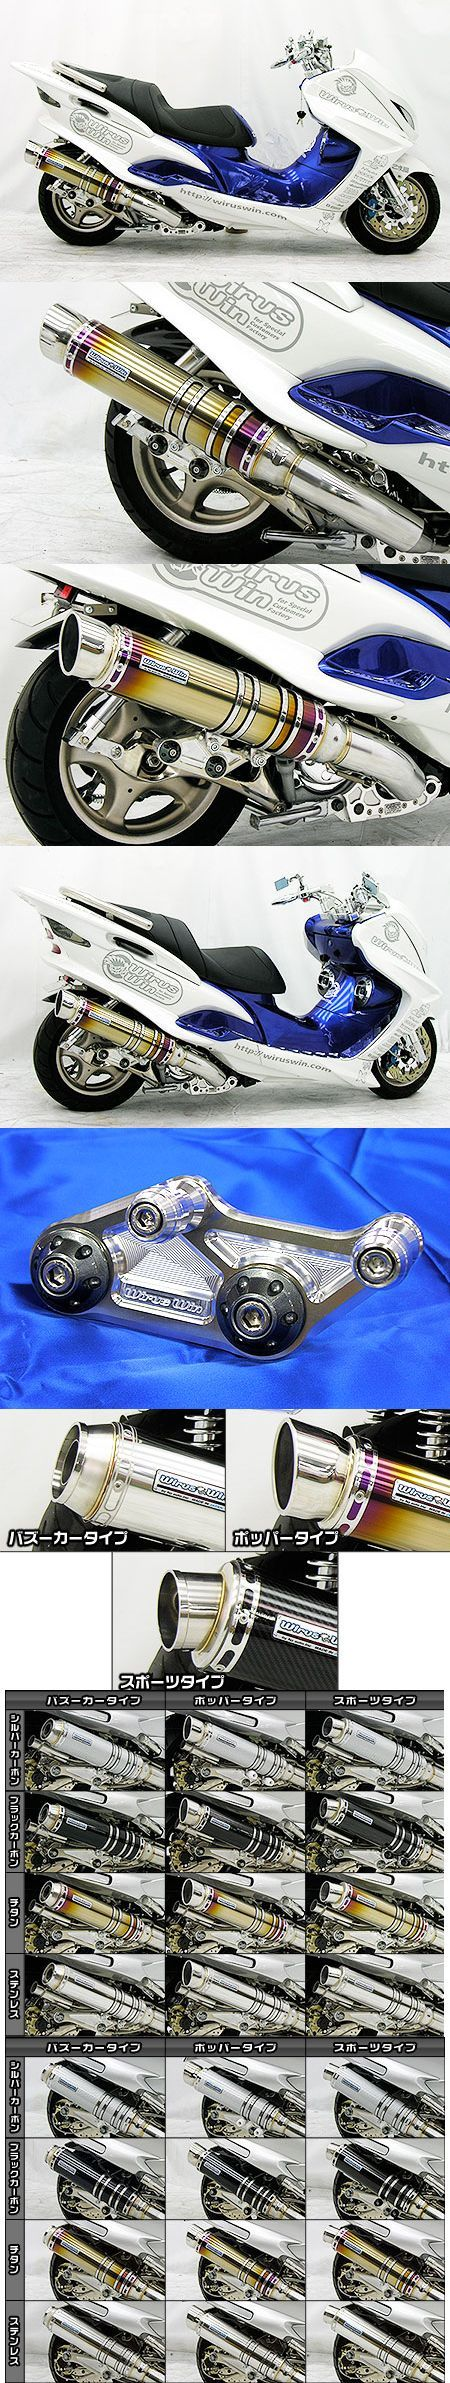 【WirusWin】Ultimate全段排氣管 鈦合金款式 Spotrs型 - 「Webike-摩托百貨」